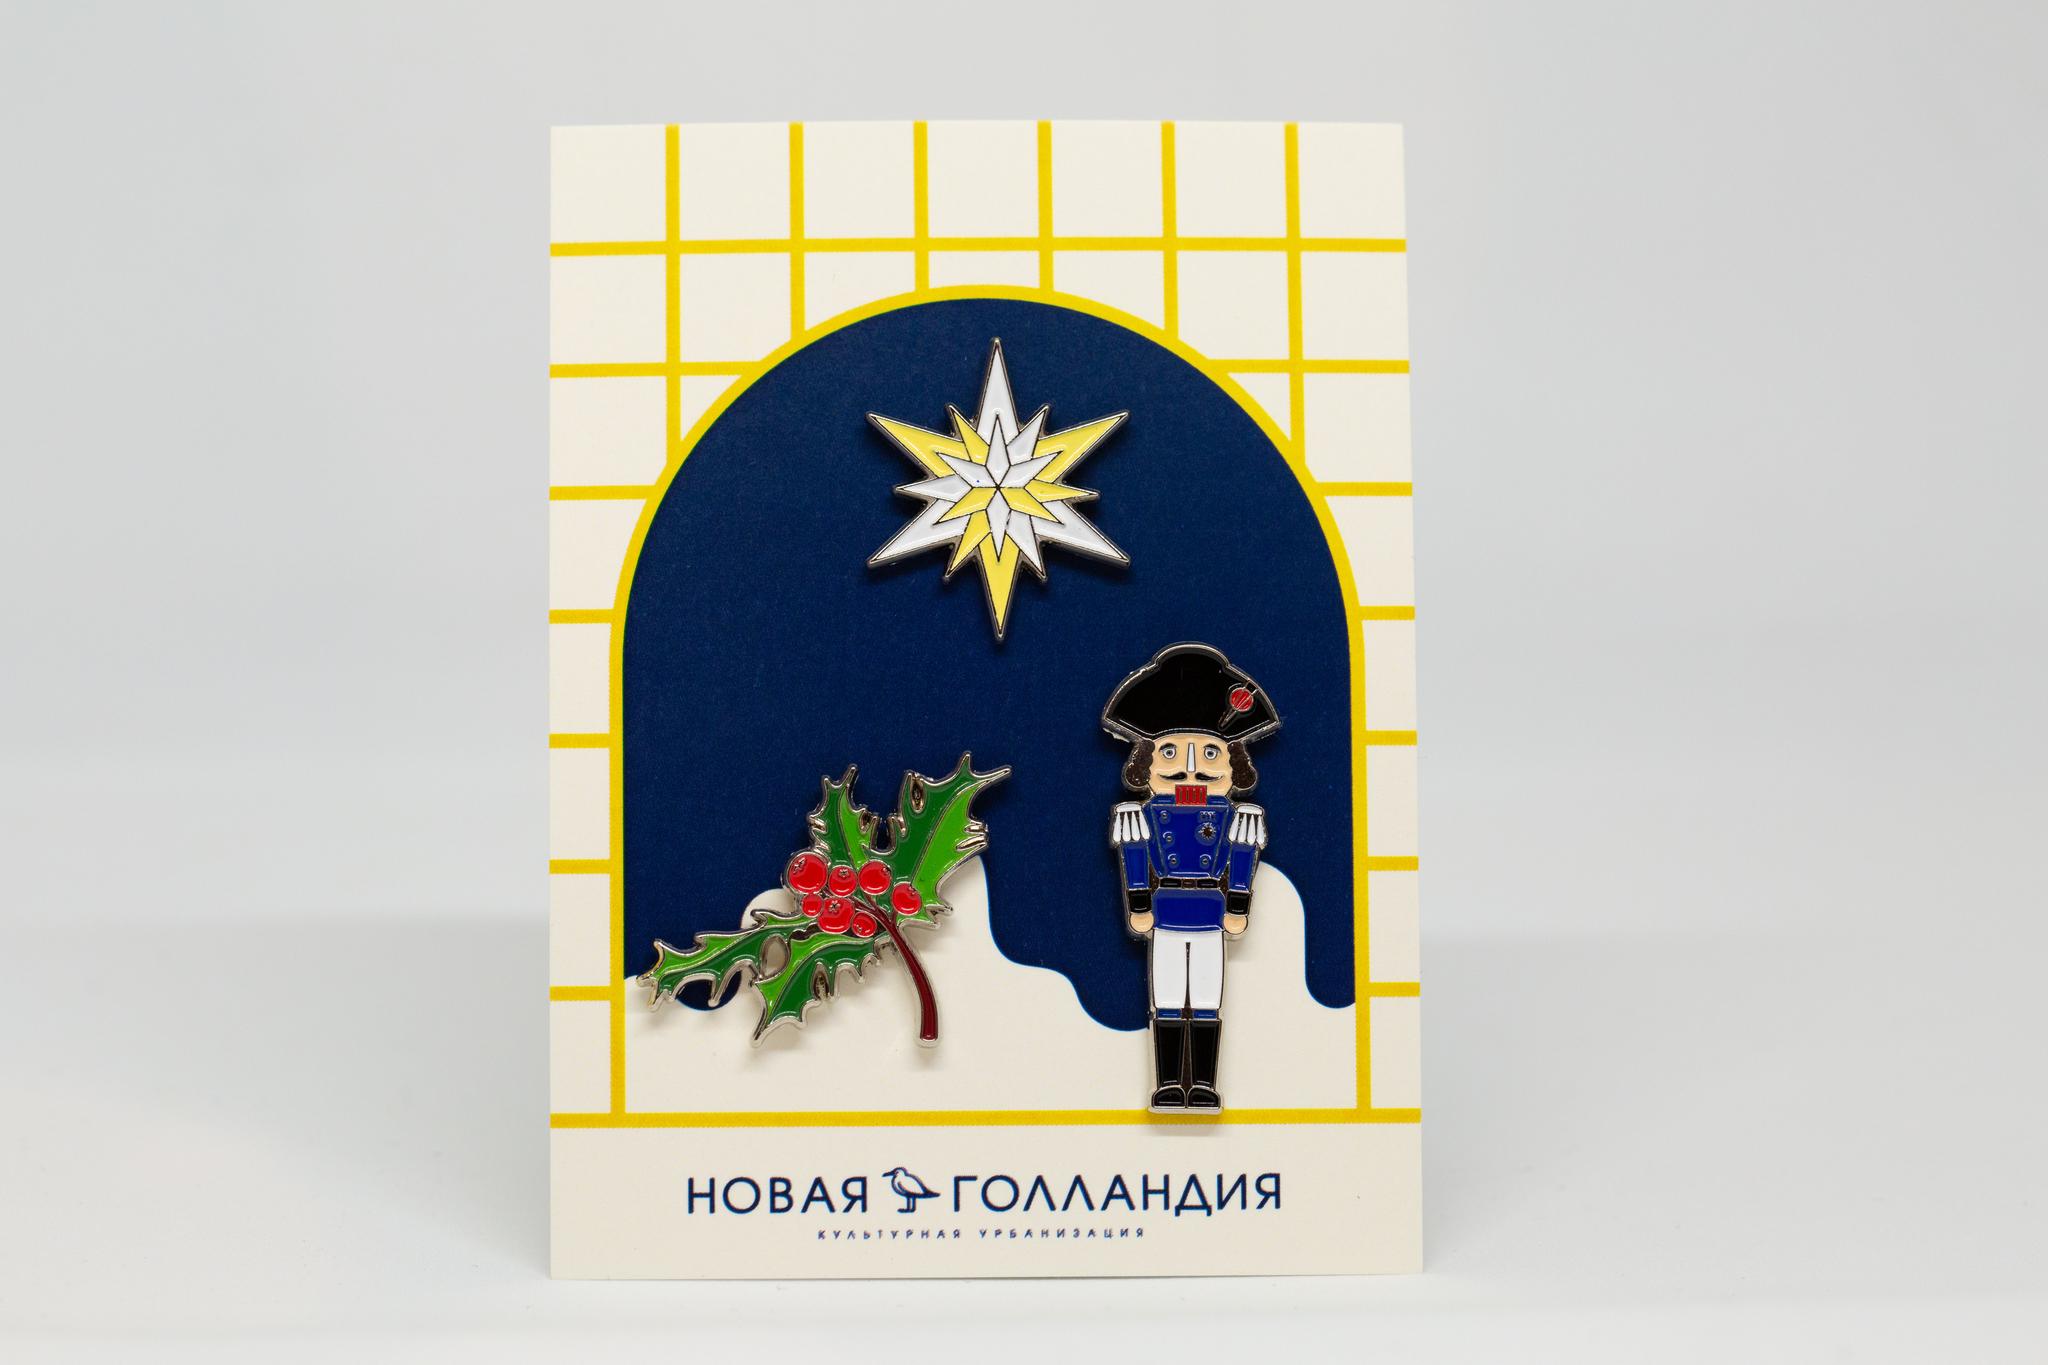 Набор новогодних значков